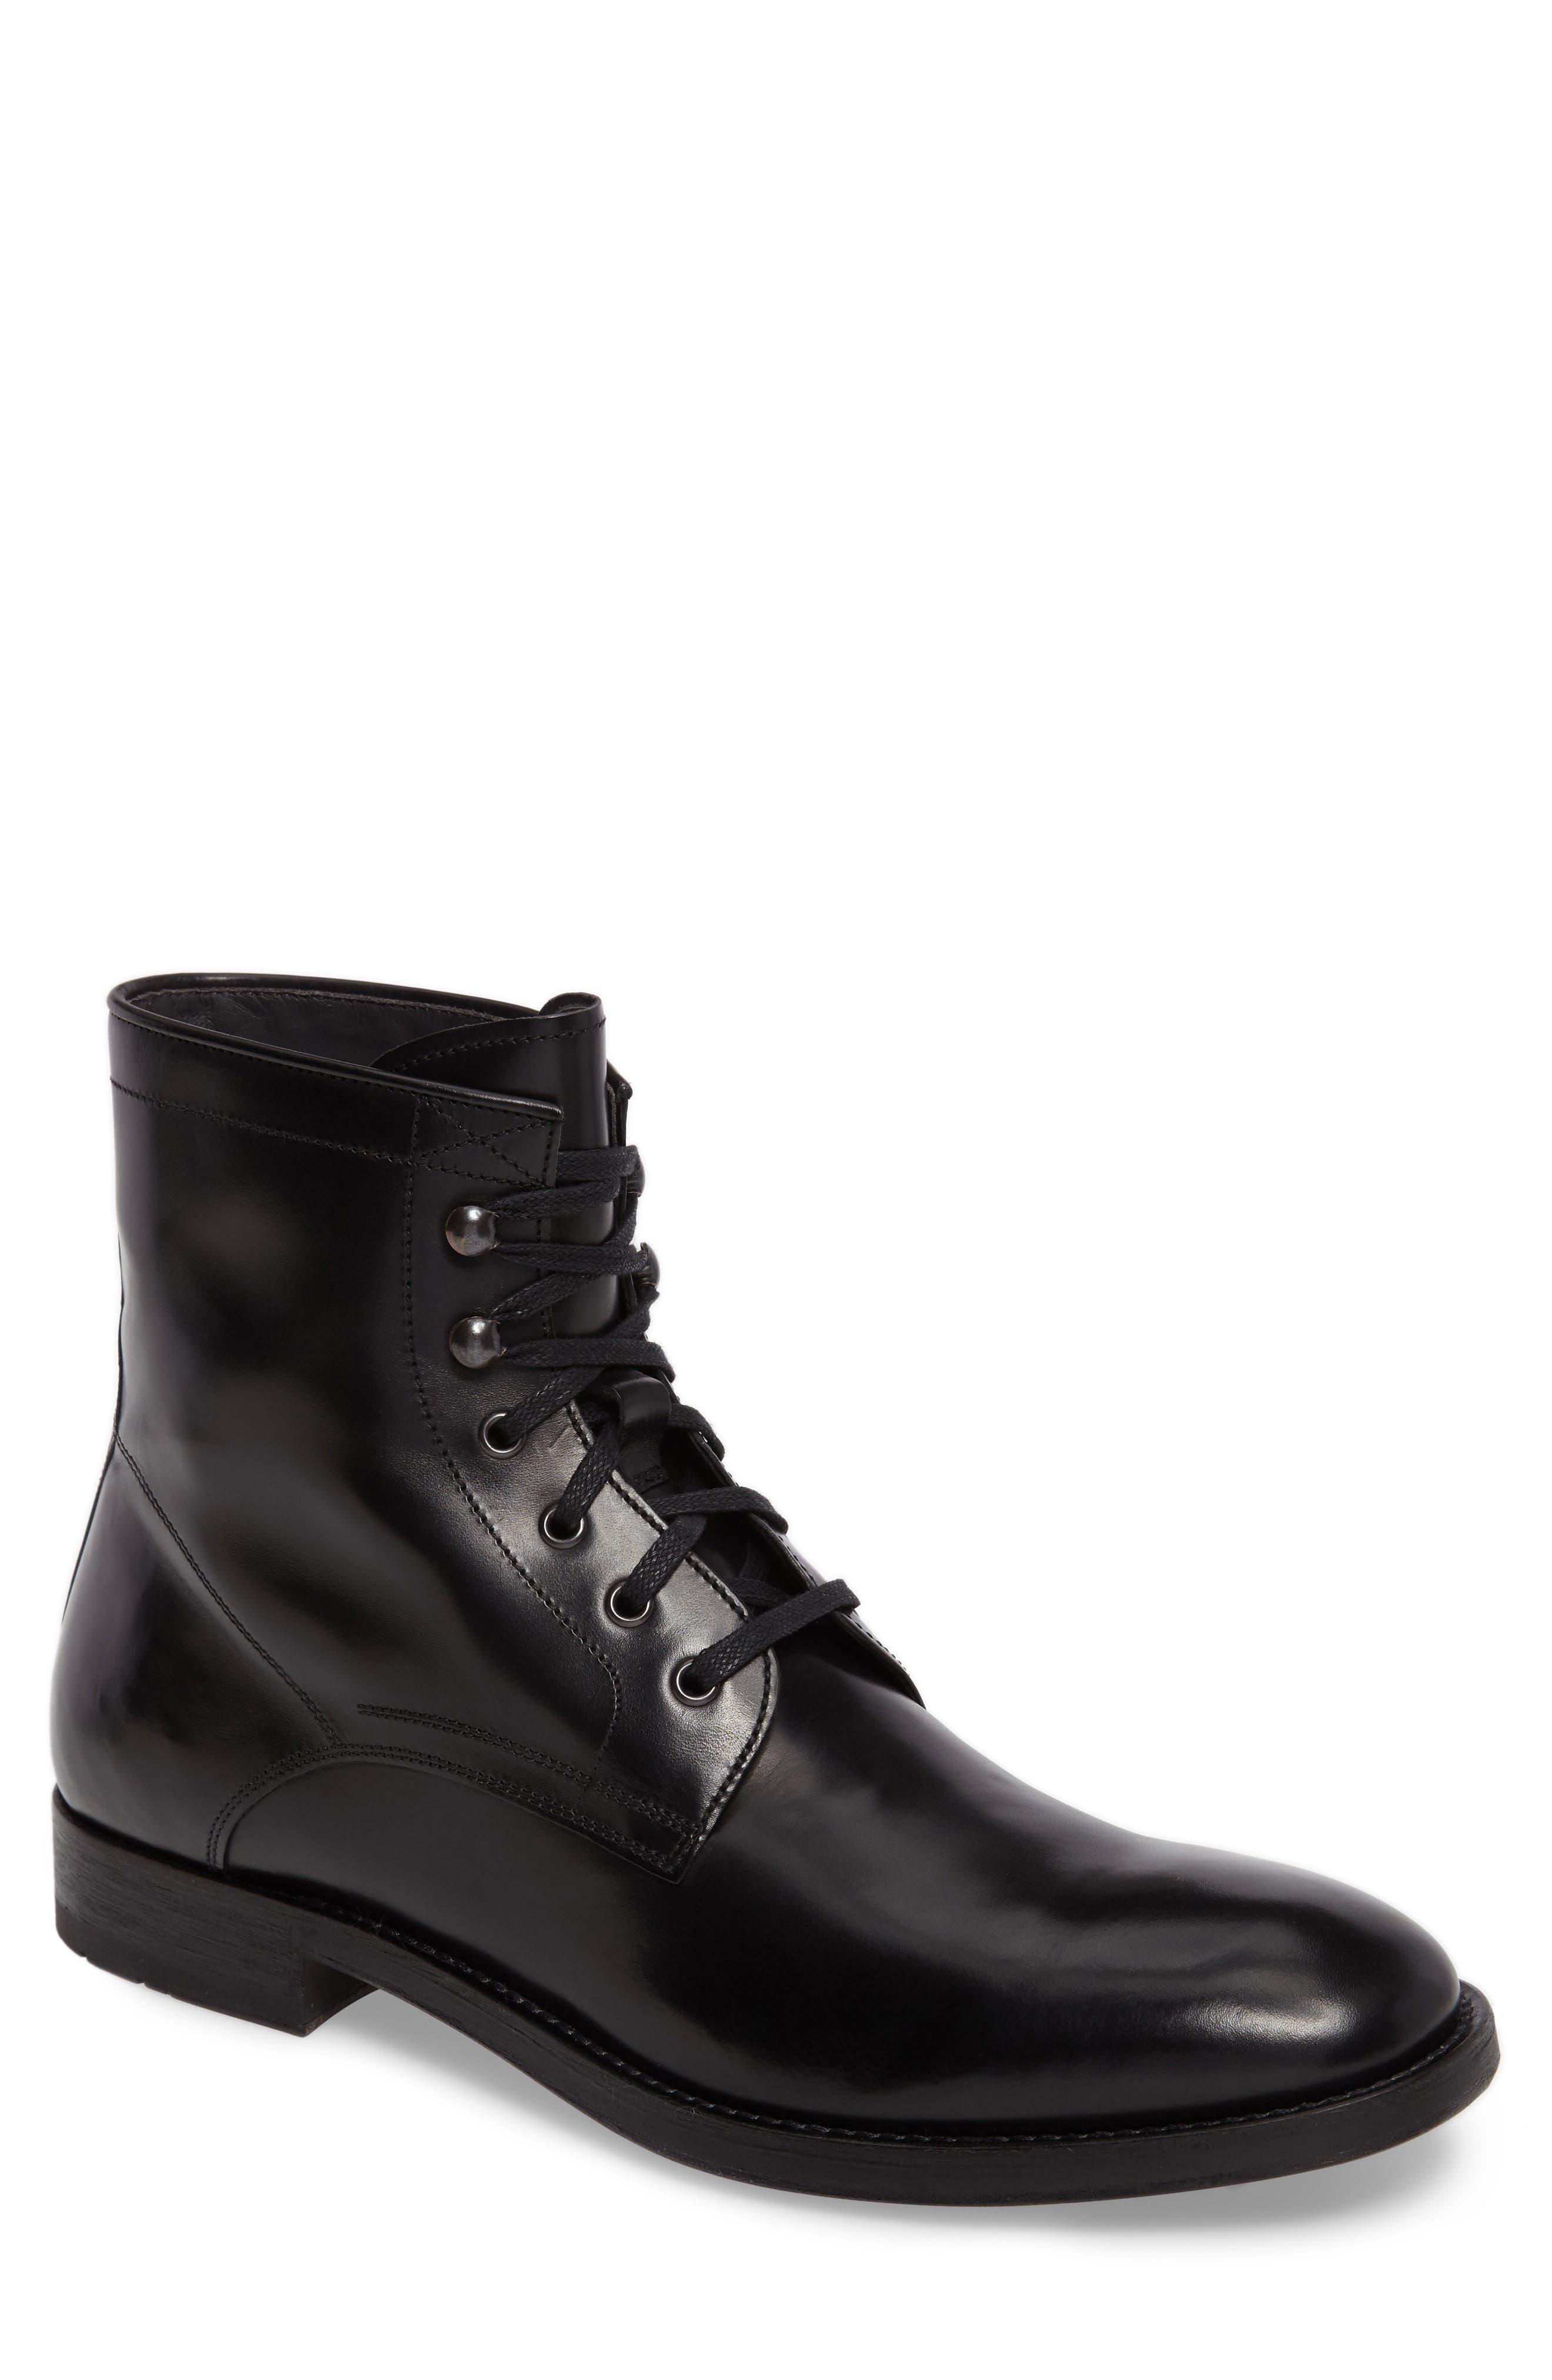 Astoria Plain Toe Boot,                         Main,                         color,